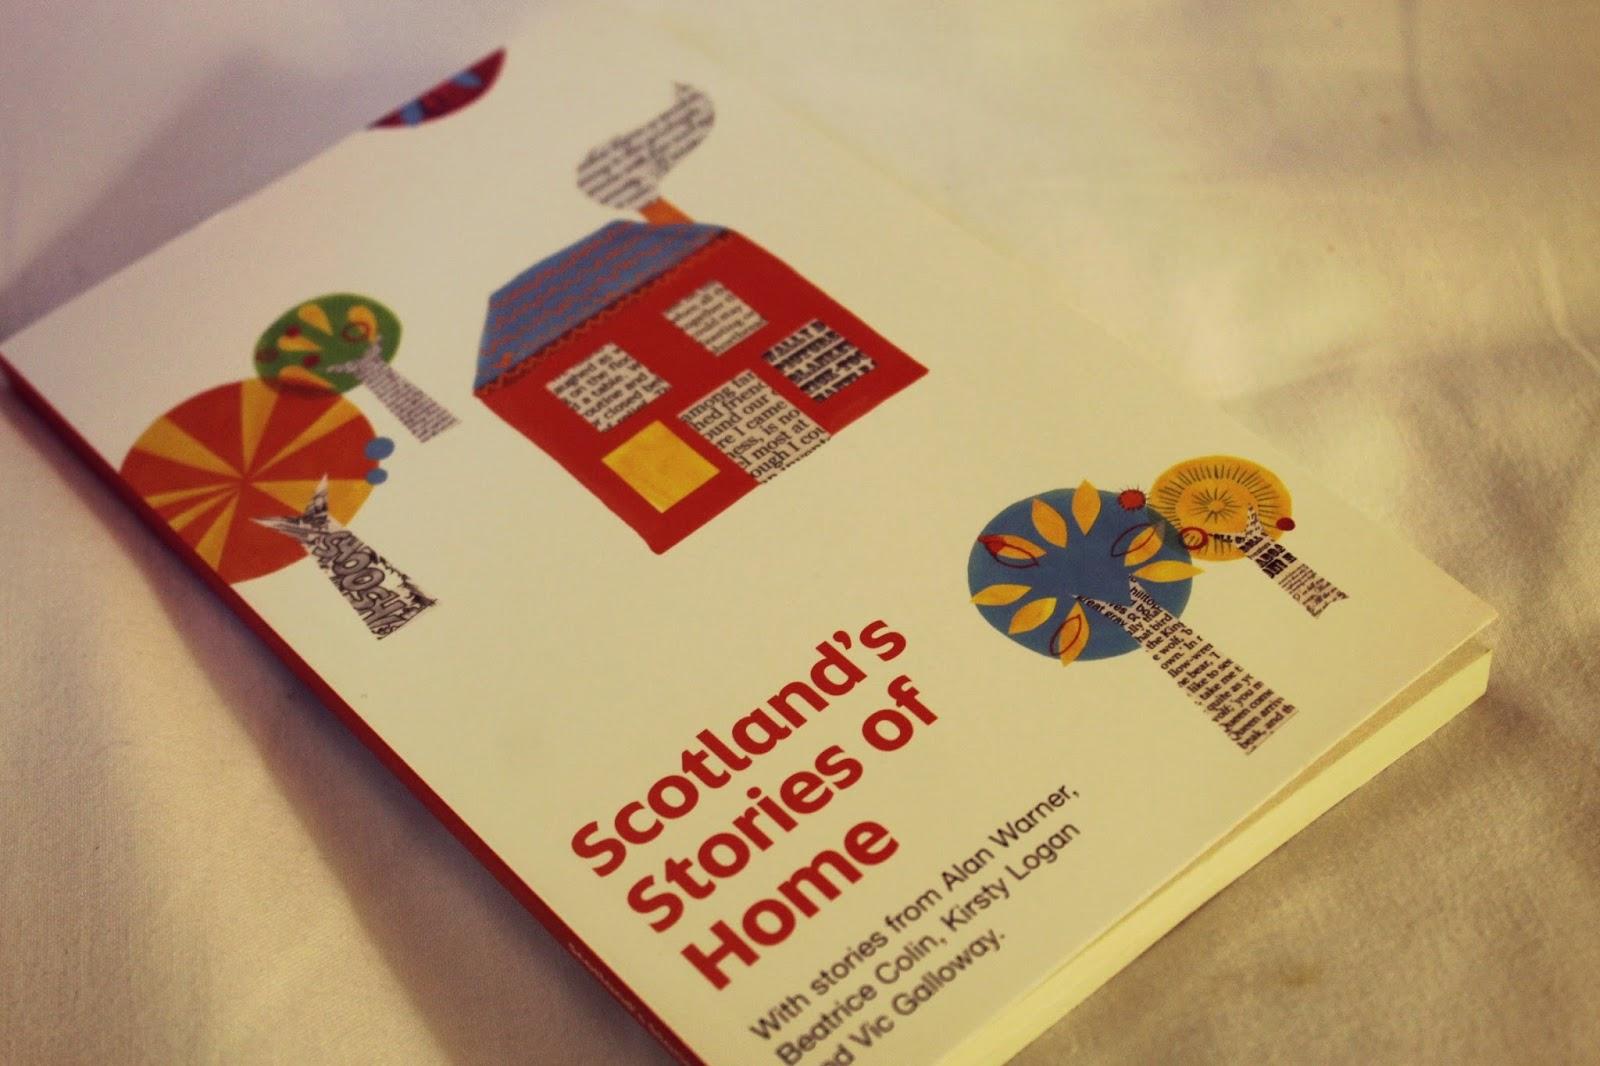 free book of scottish stories